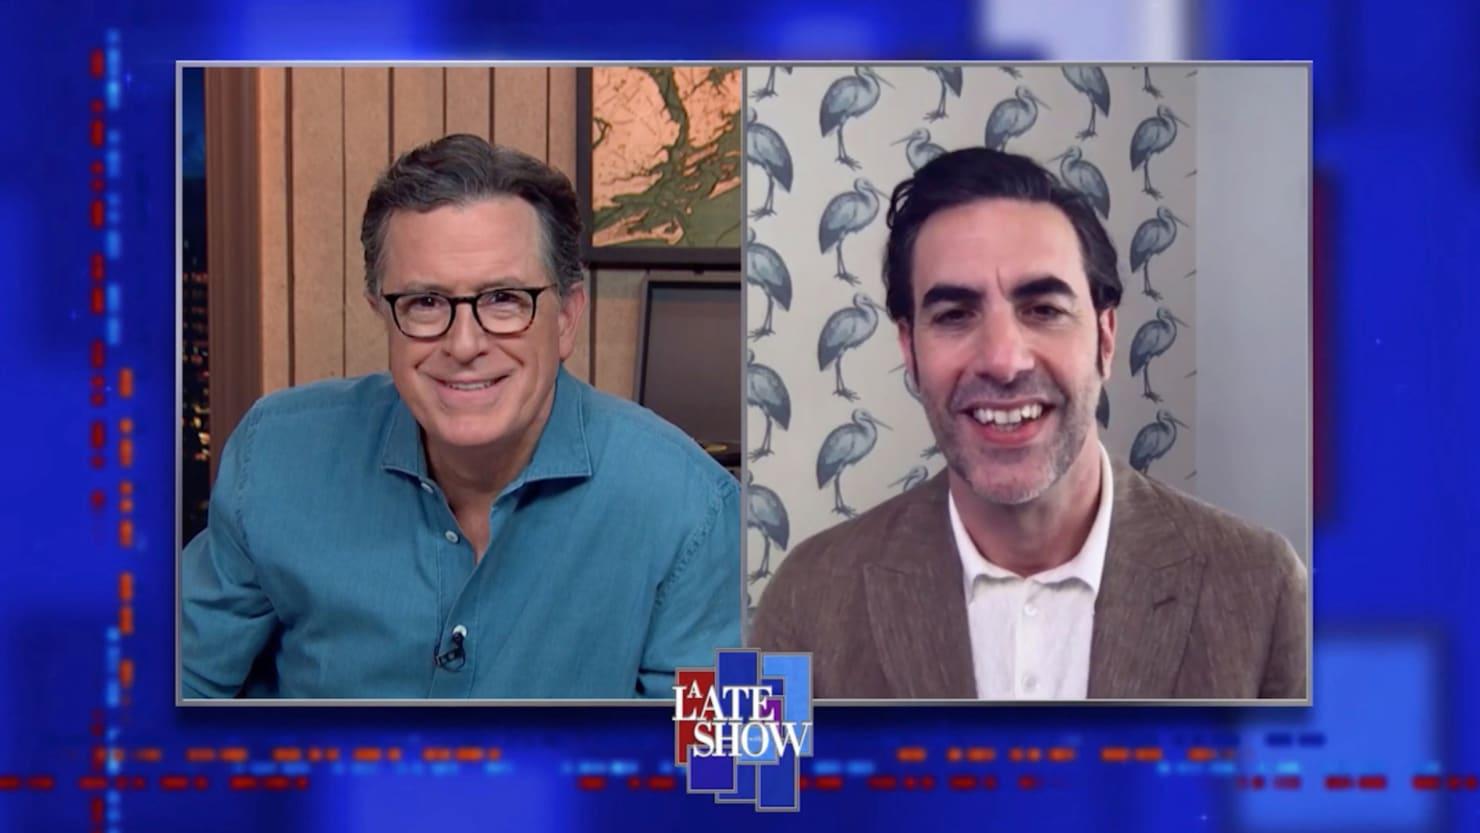 Sacha Baron Cohen Fires Back at Trump and Rudy Giuliani on 'Colbert'